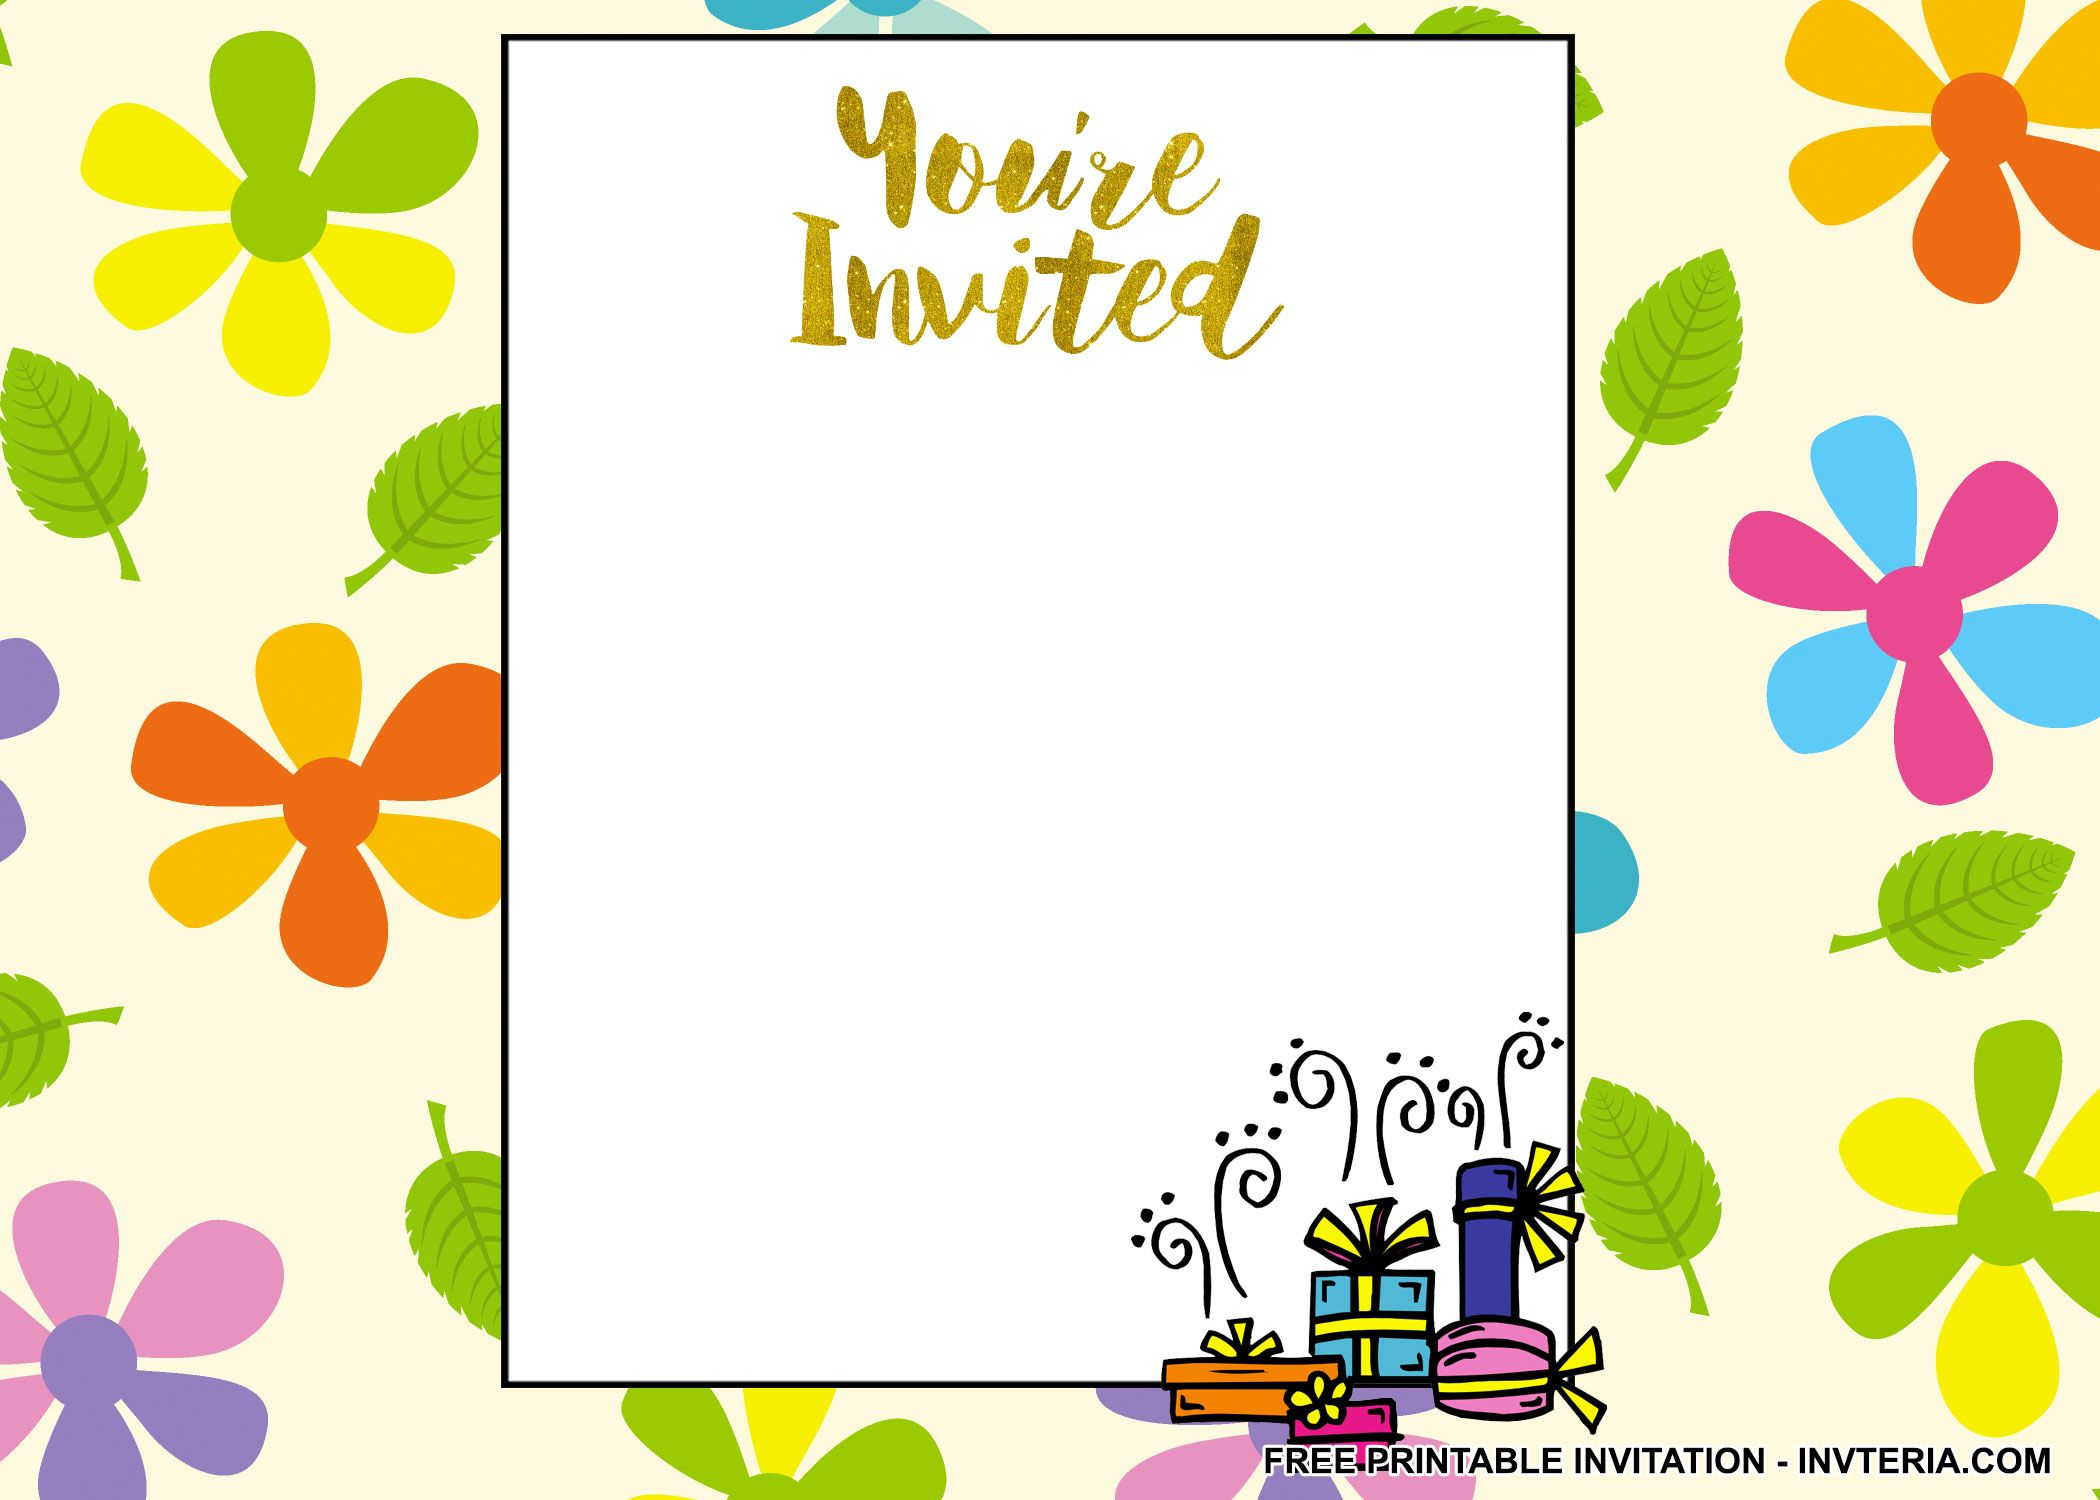 COOL FREE 6TH BIRTHDAY INVITATION WORDING IDEA